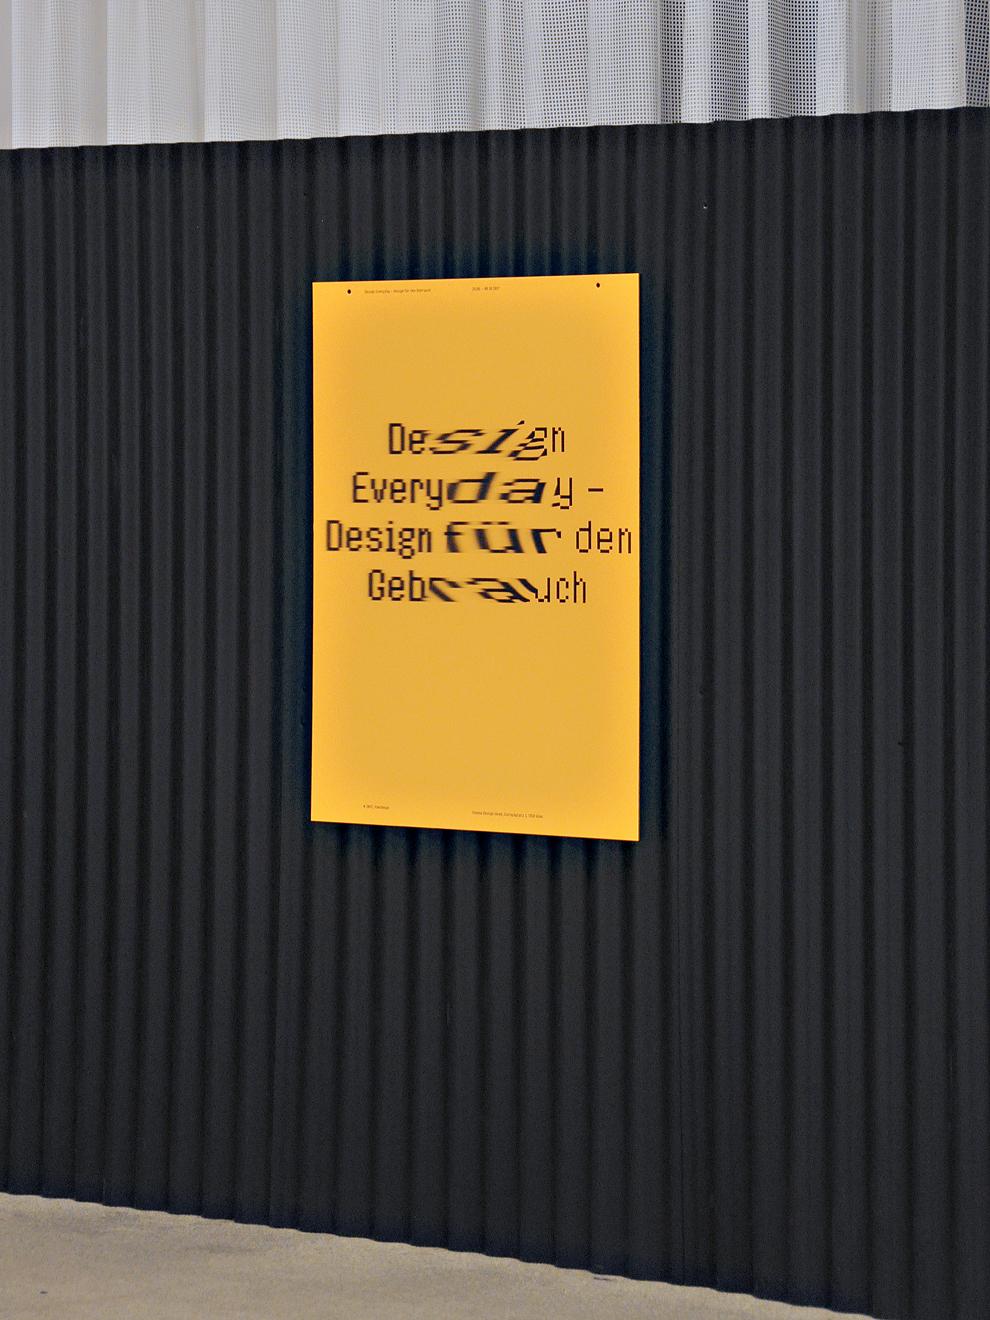 Vandasye_Design-Everyday_1_Poster